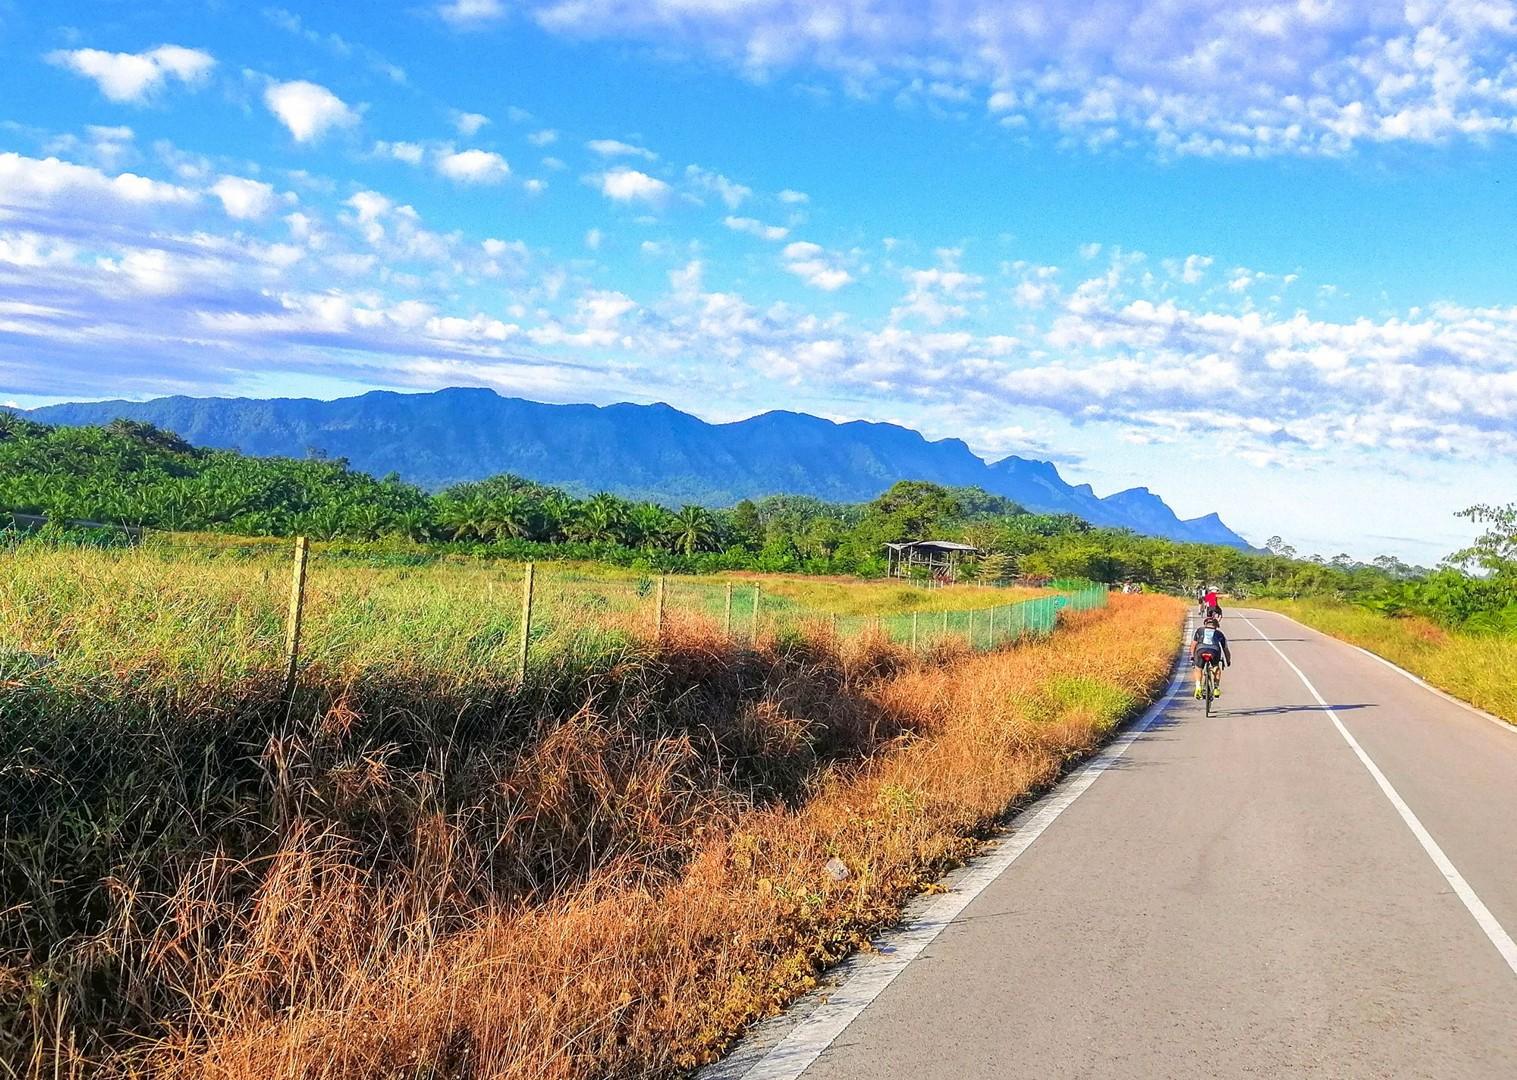 sarawak-to-sabah-trip-borneo-holiday-road-cycling.jpg - Borneo - Sarawak to Sabah - Guided Road Cycling Holiday - Road Cycling